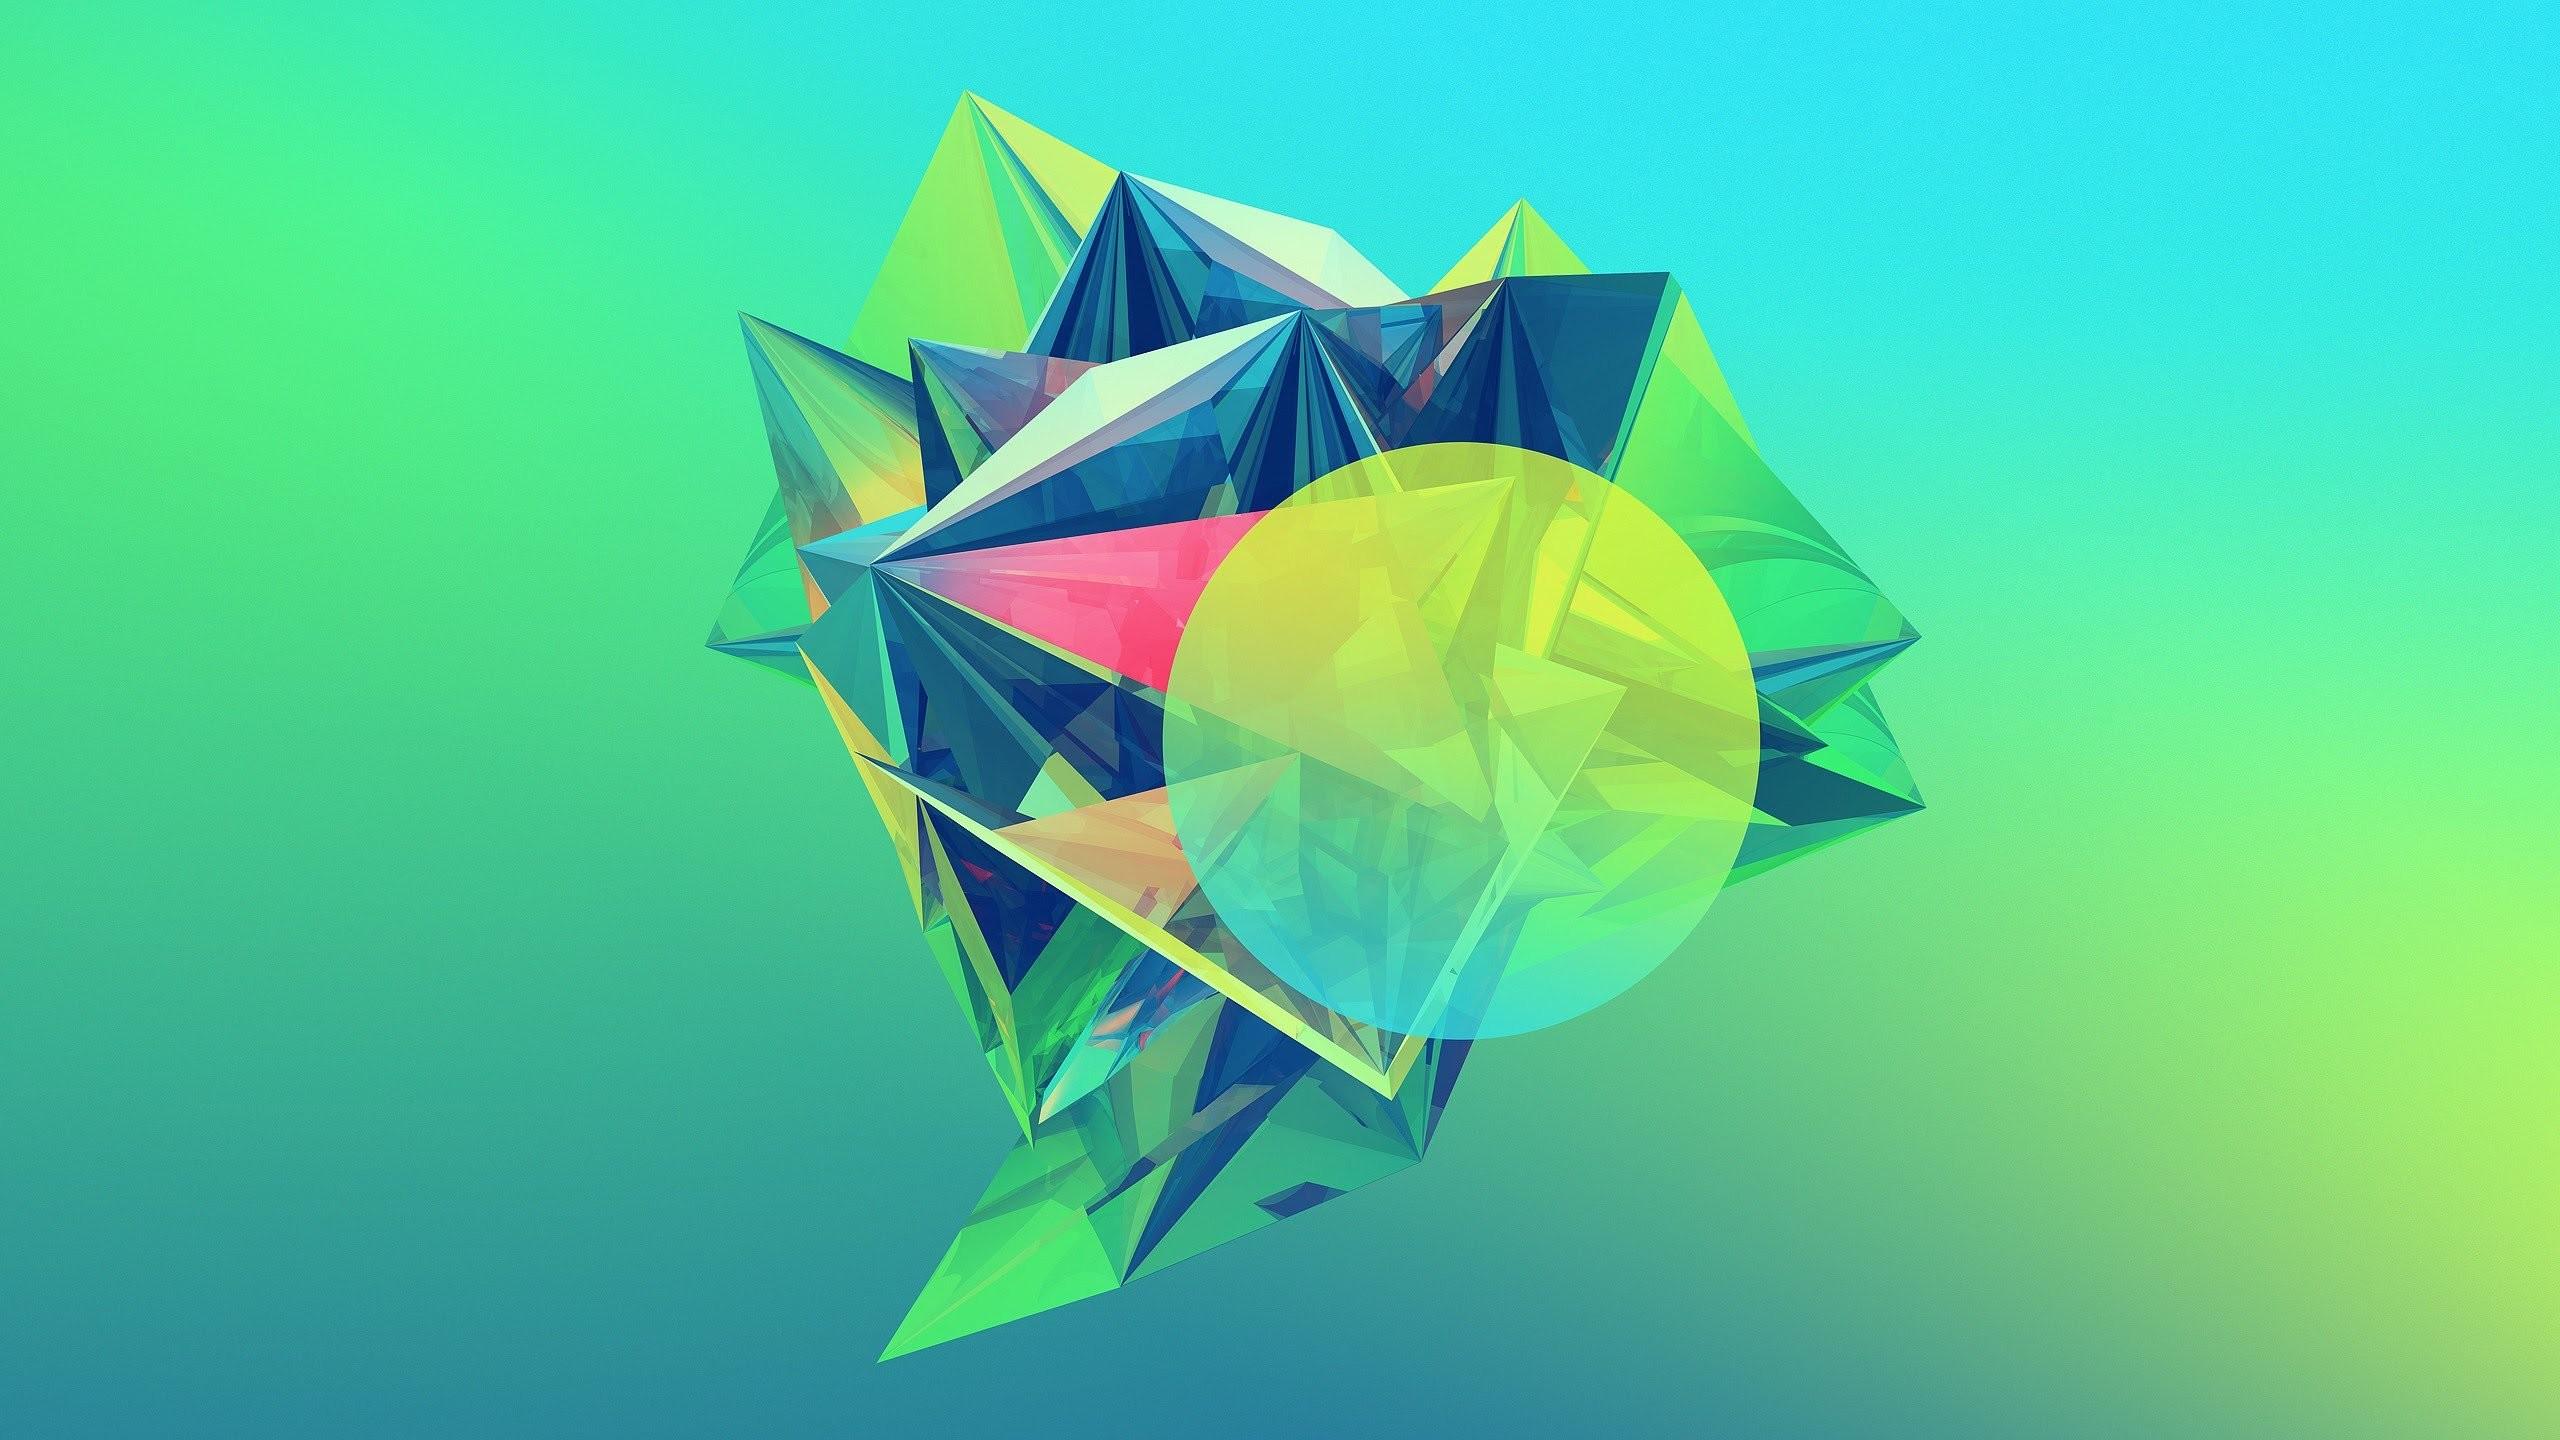 Wonderful Wallpaper Mac Geometric - 595654-download-geometry-wallpapers-2560x1440-for-iphone-5  Picture_1003528.jpg